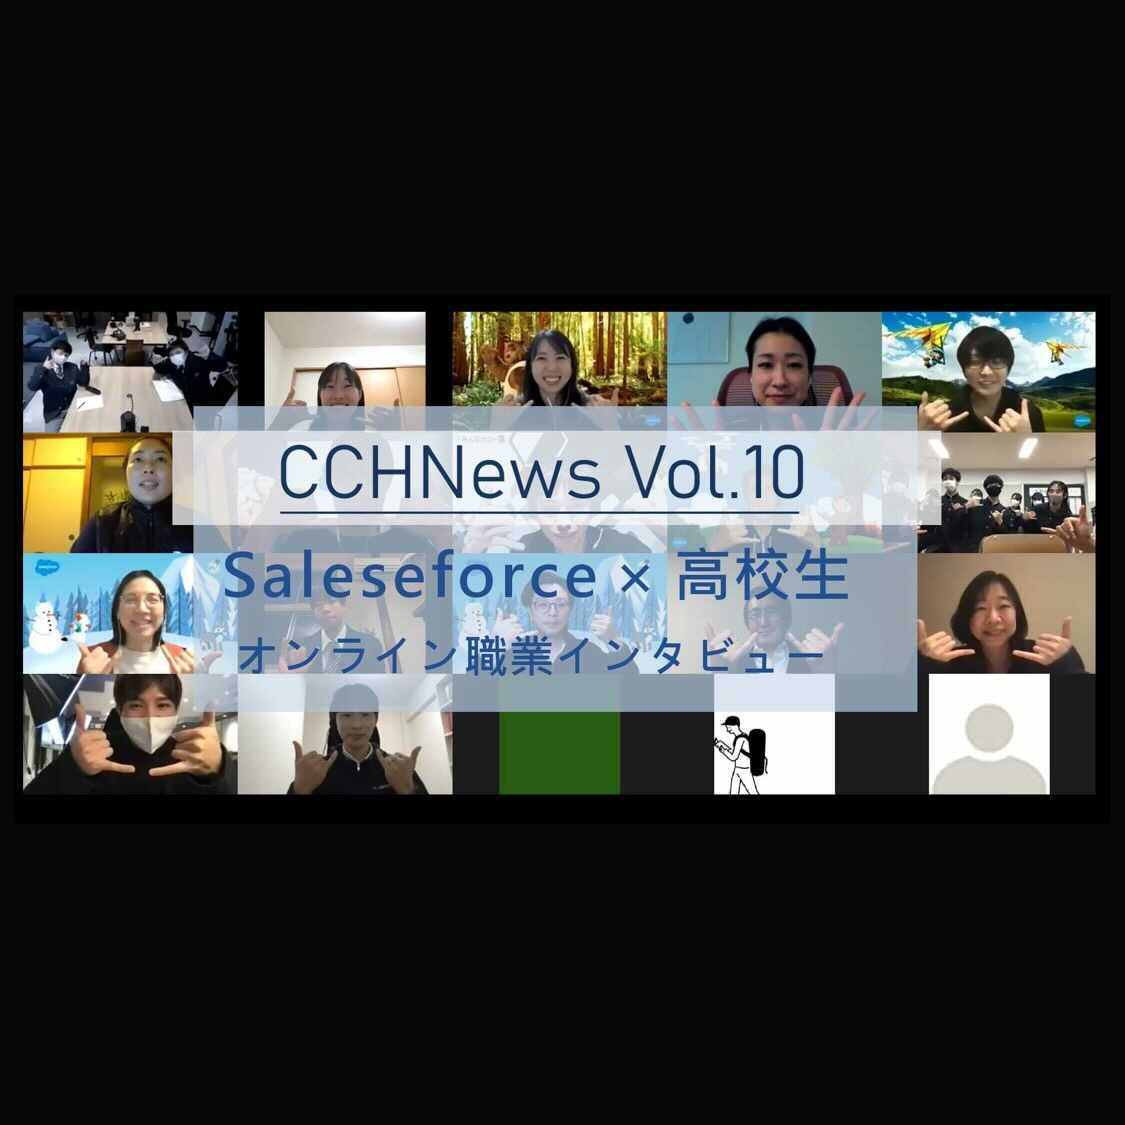 [CCH News vol.10]オンライン職業インタビューを開催!